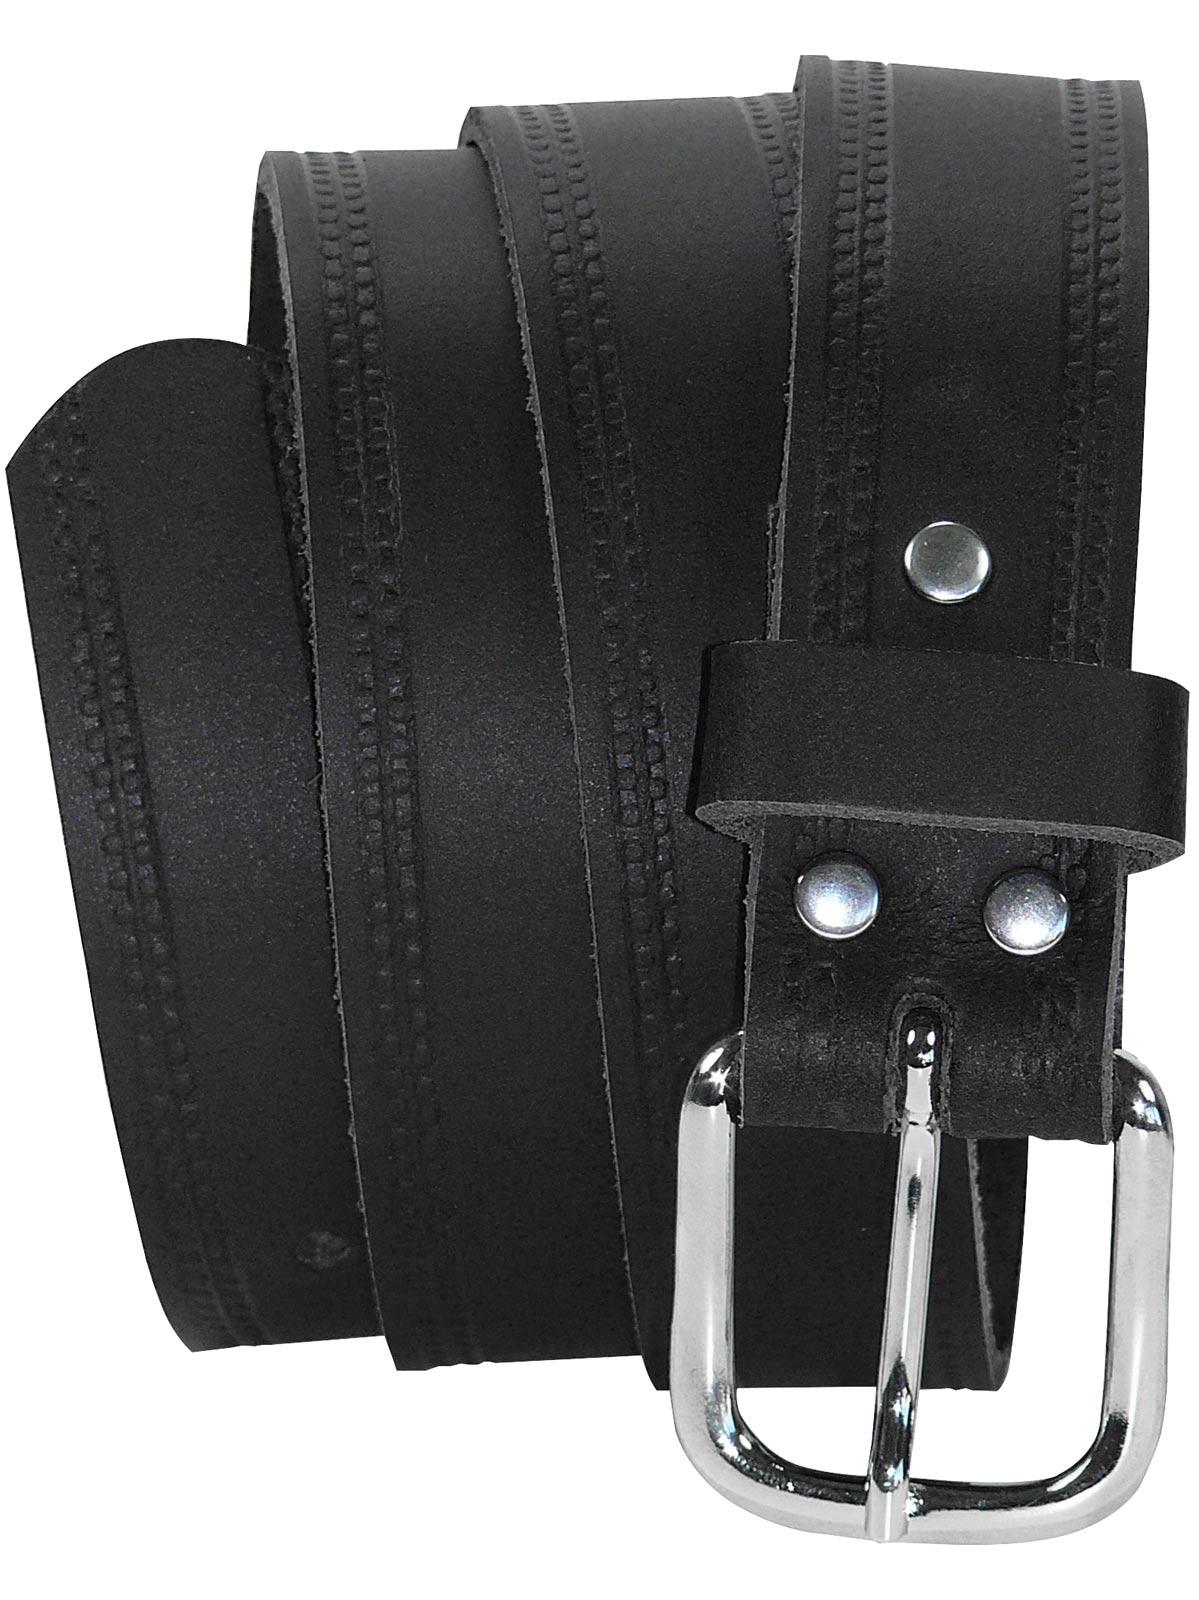 Herren Ledergürtel Echt Leder Gürtel 85-135cm 3,8cm Damen Ledergürtel breit